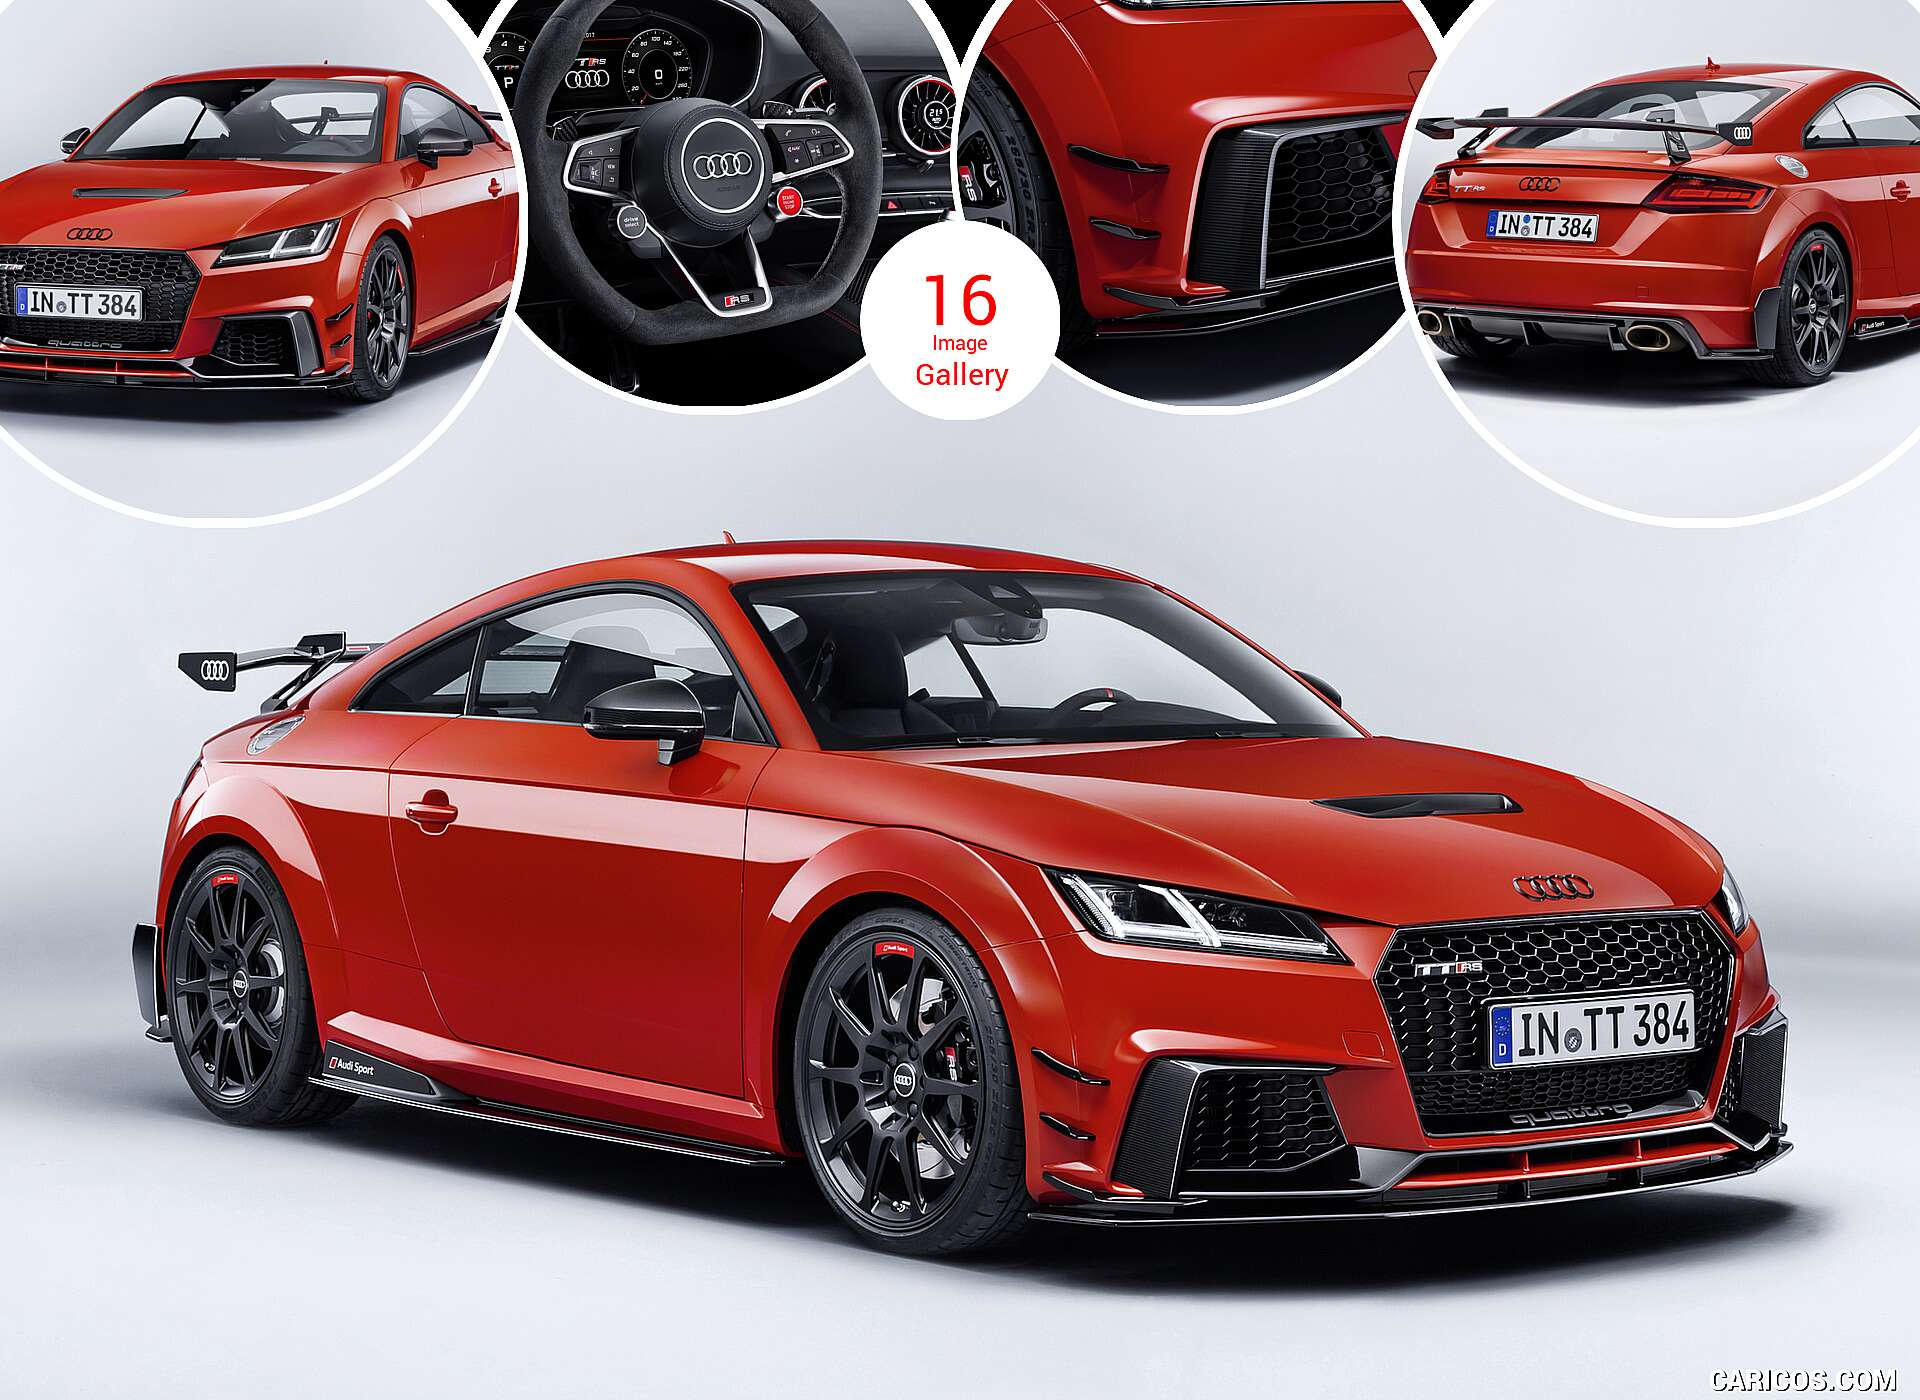 Audi tt 2.0 tfsi quattro s tronic sport (10.2014 - 10.2017) - технические характеристики